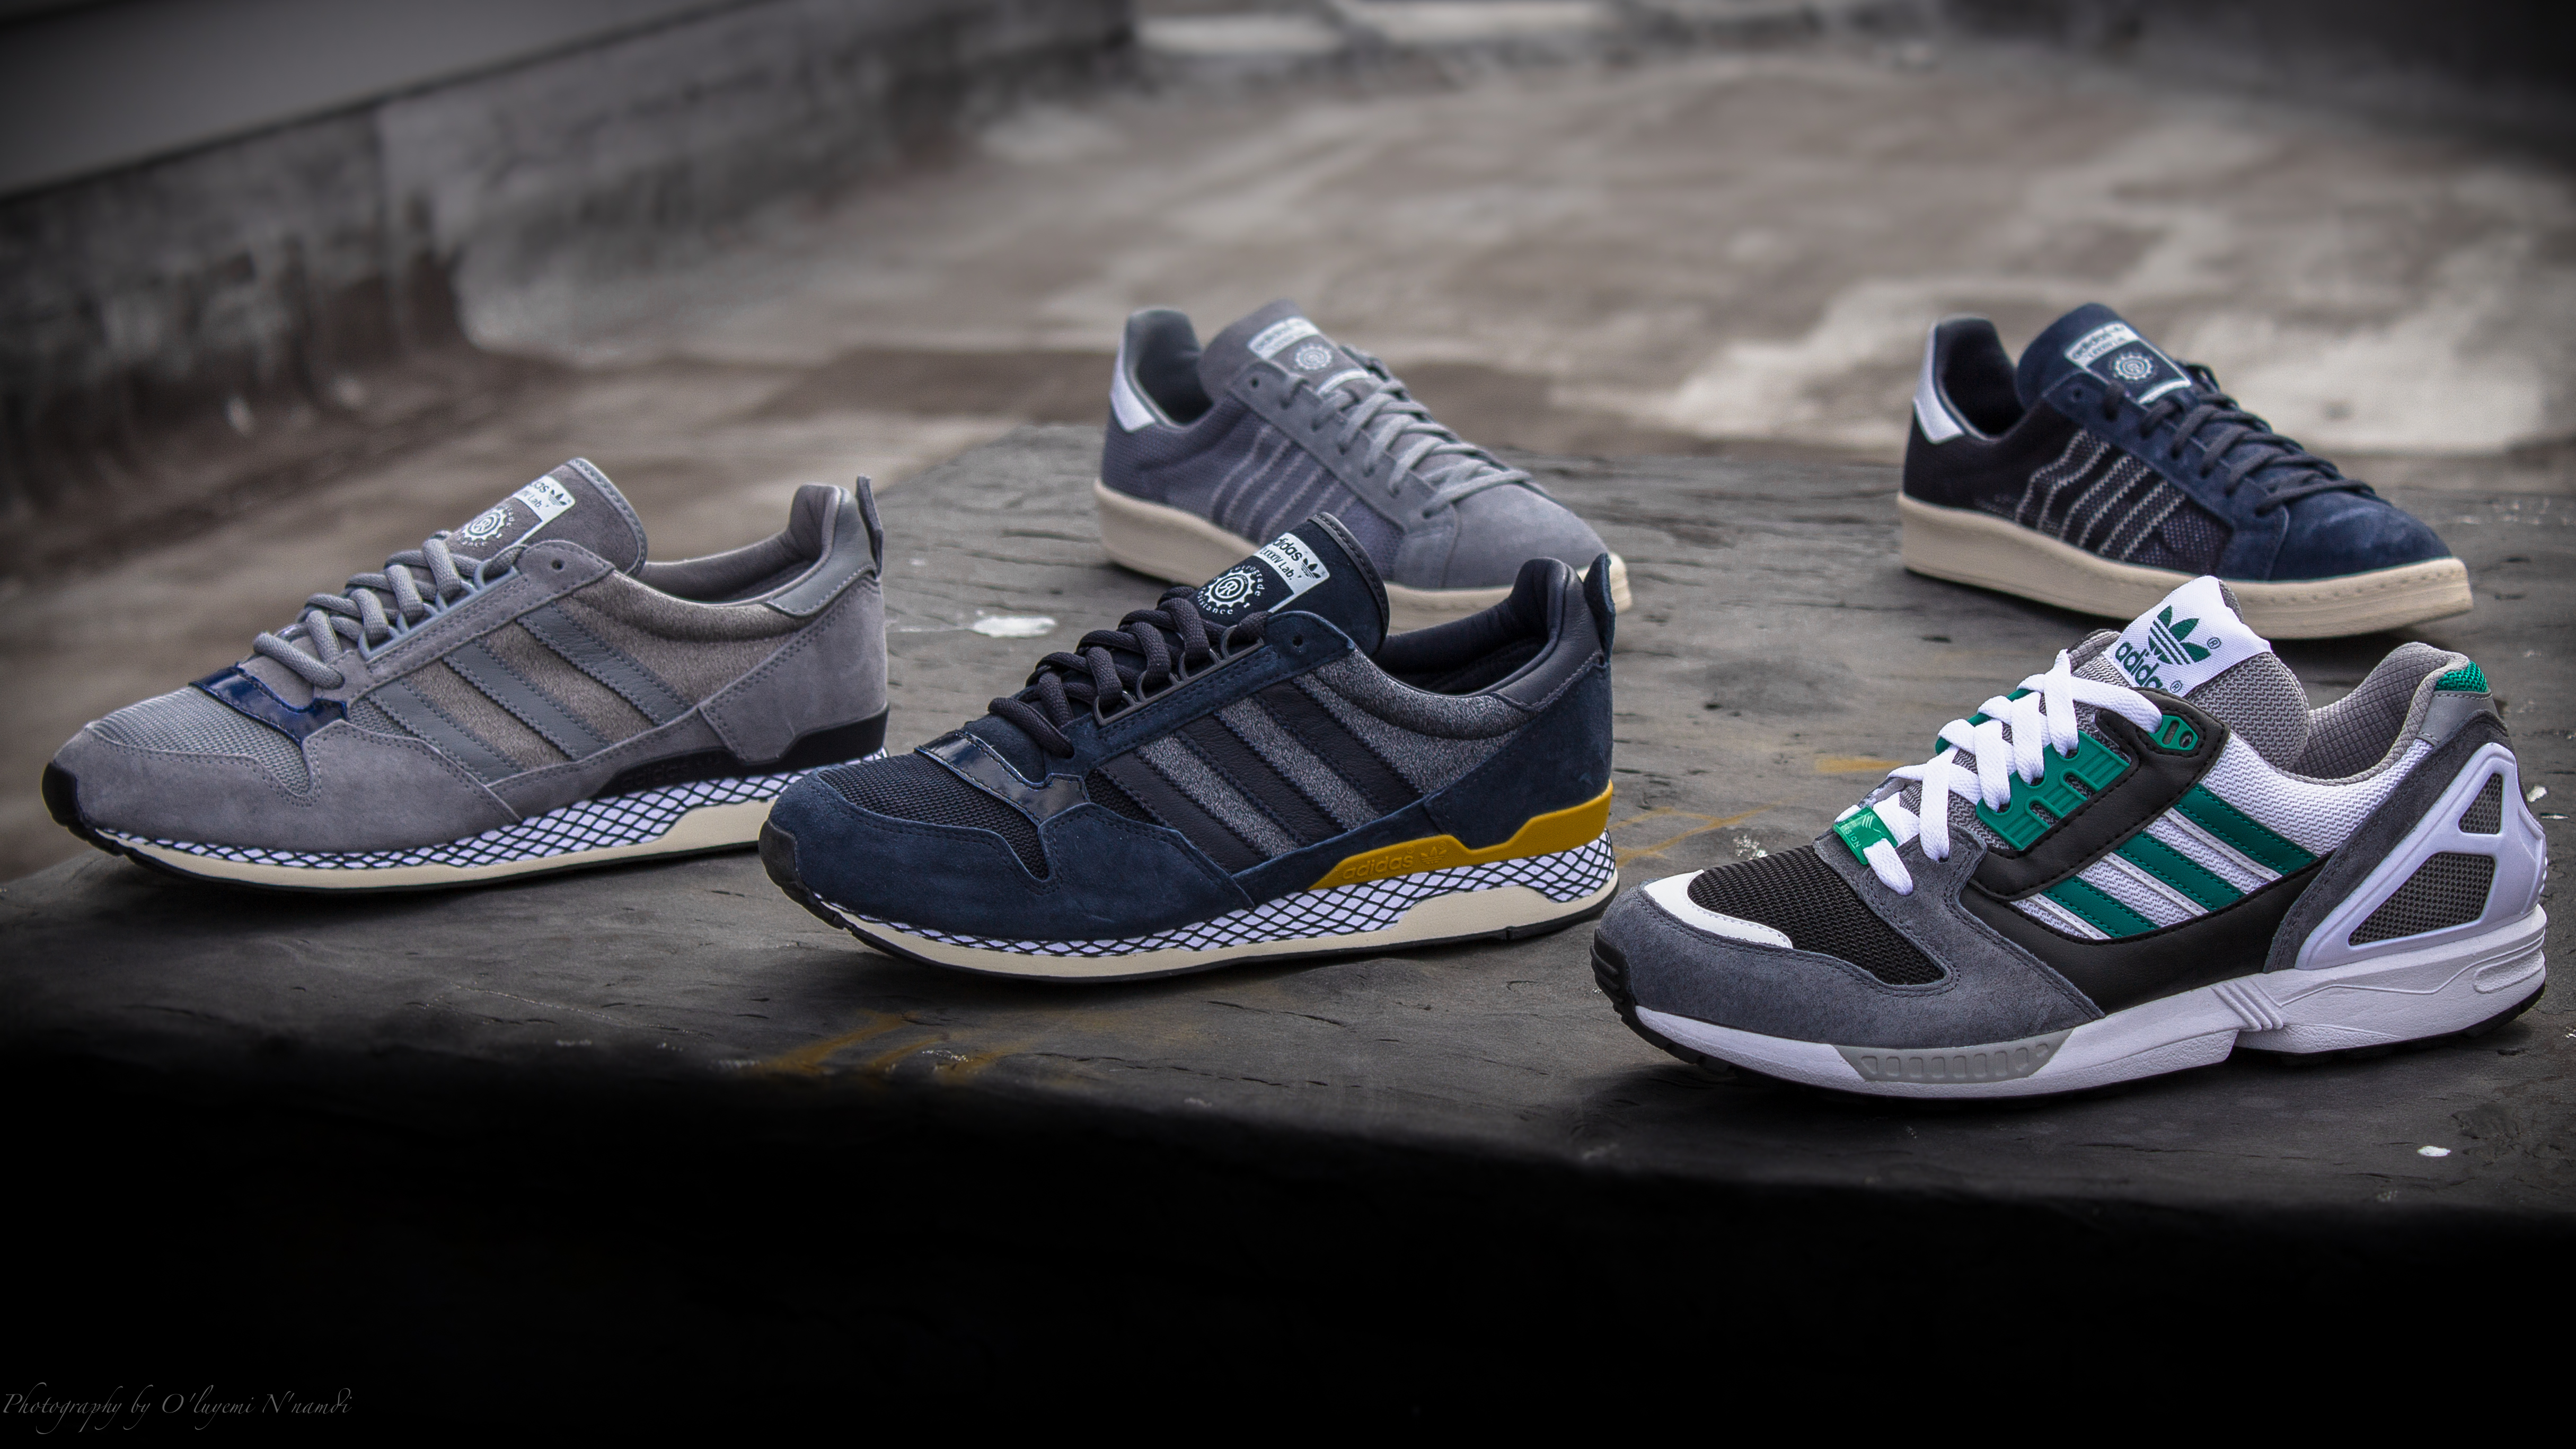 Mita x adidas zx 8000 & kazuki 84 raccolta @ packer scarpe